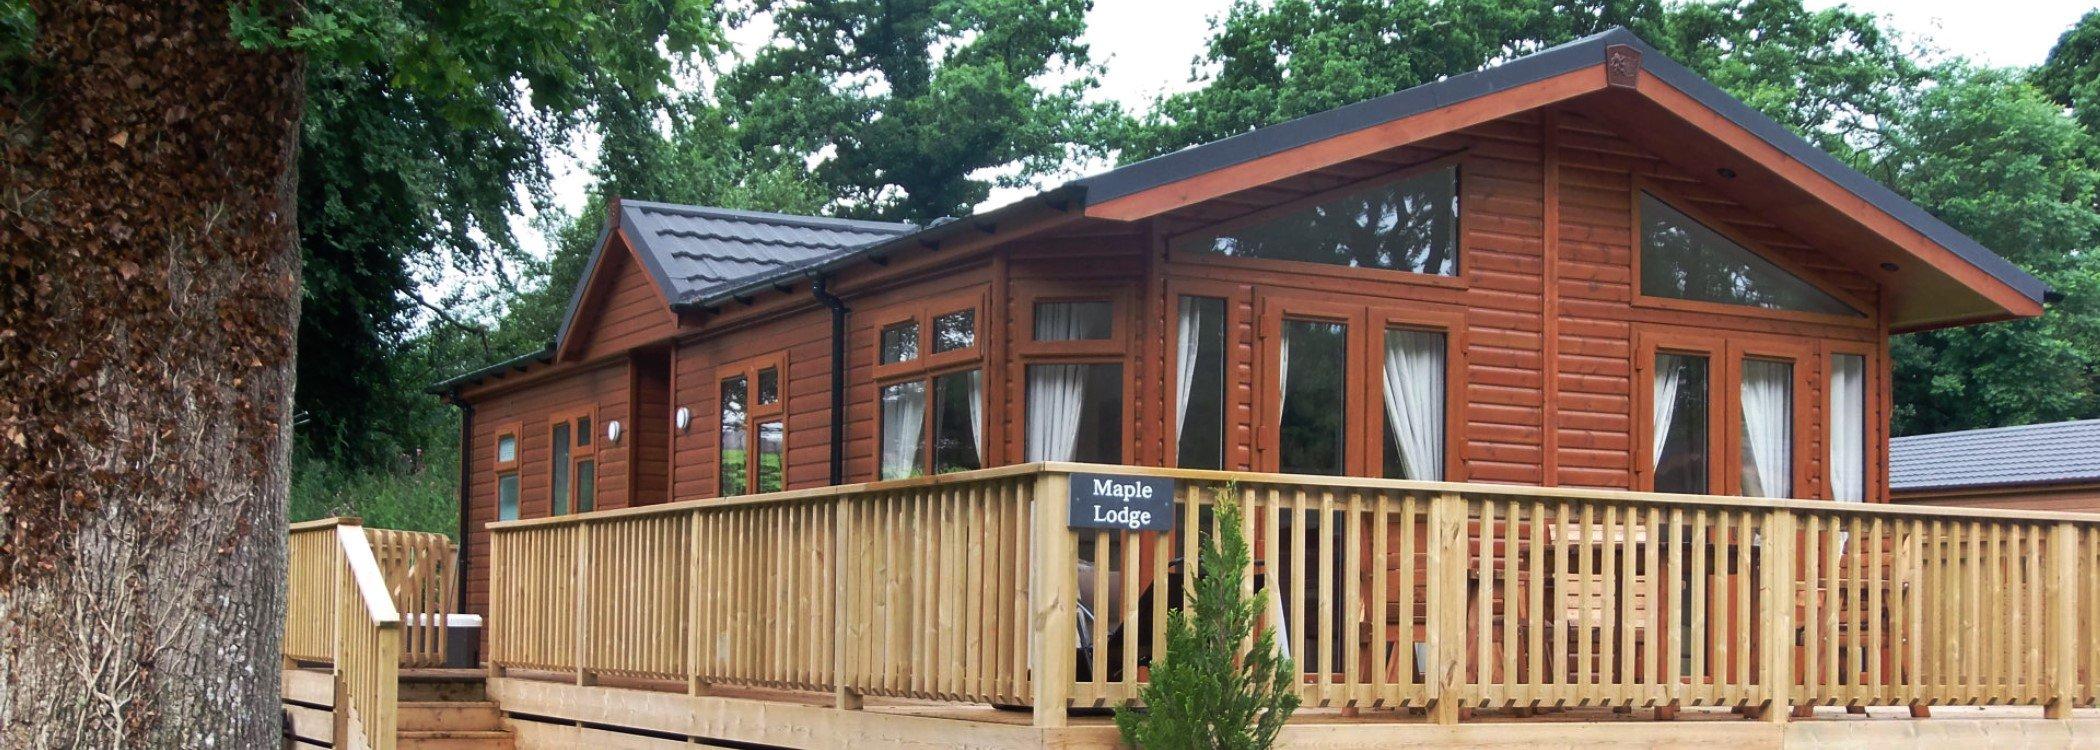 Log cabin Okehampton